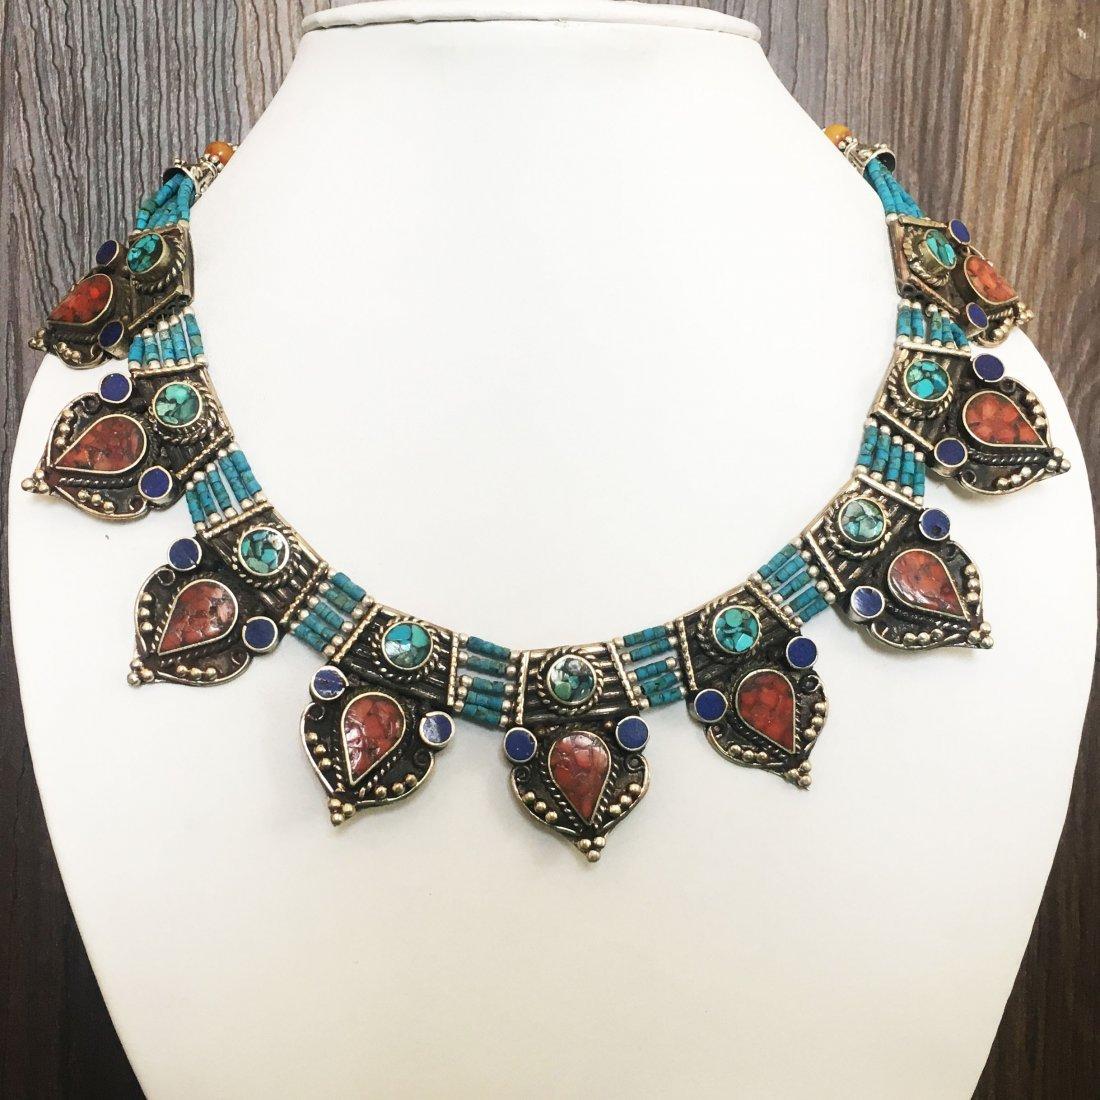 Tibetan Vintage Turquoise & Coral Necklace